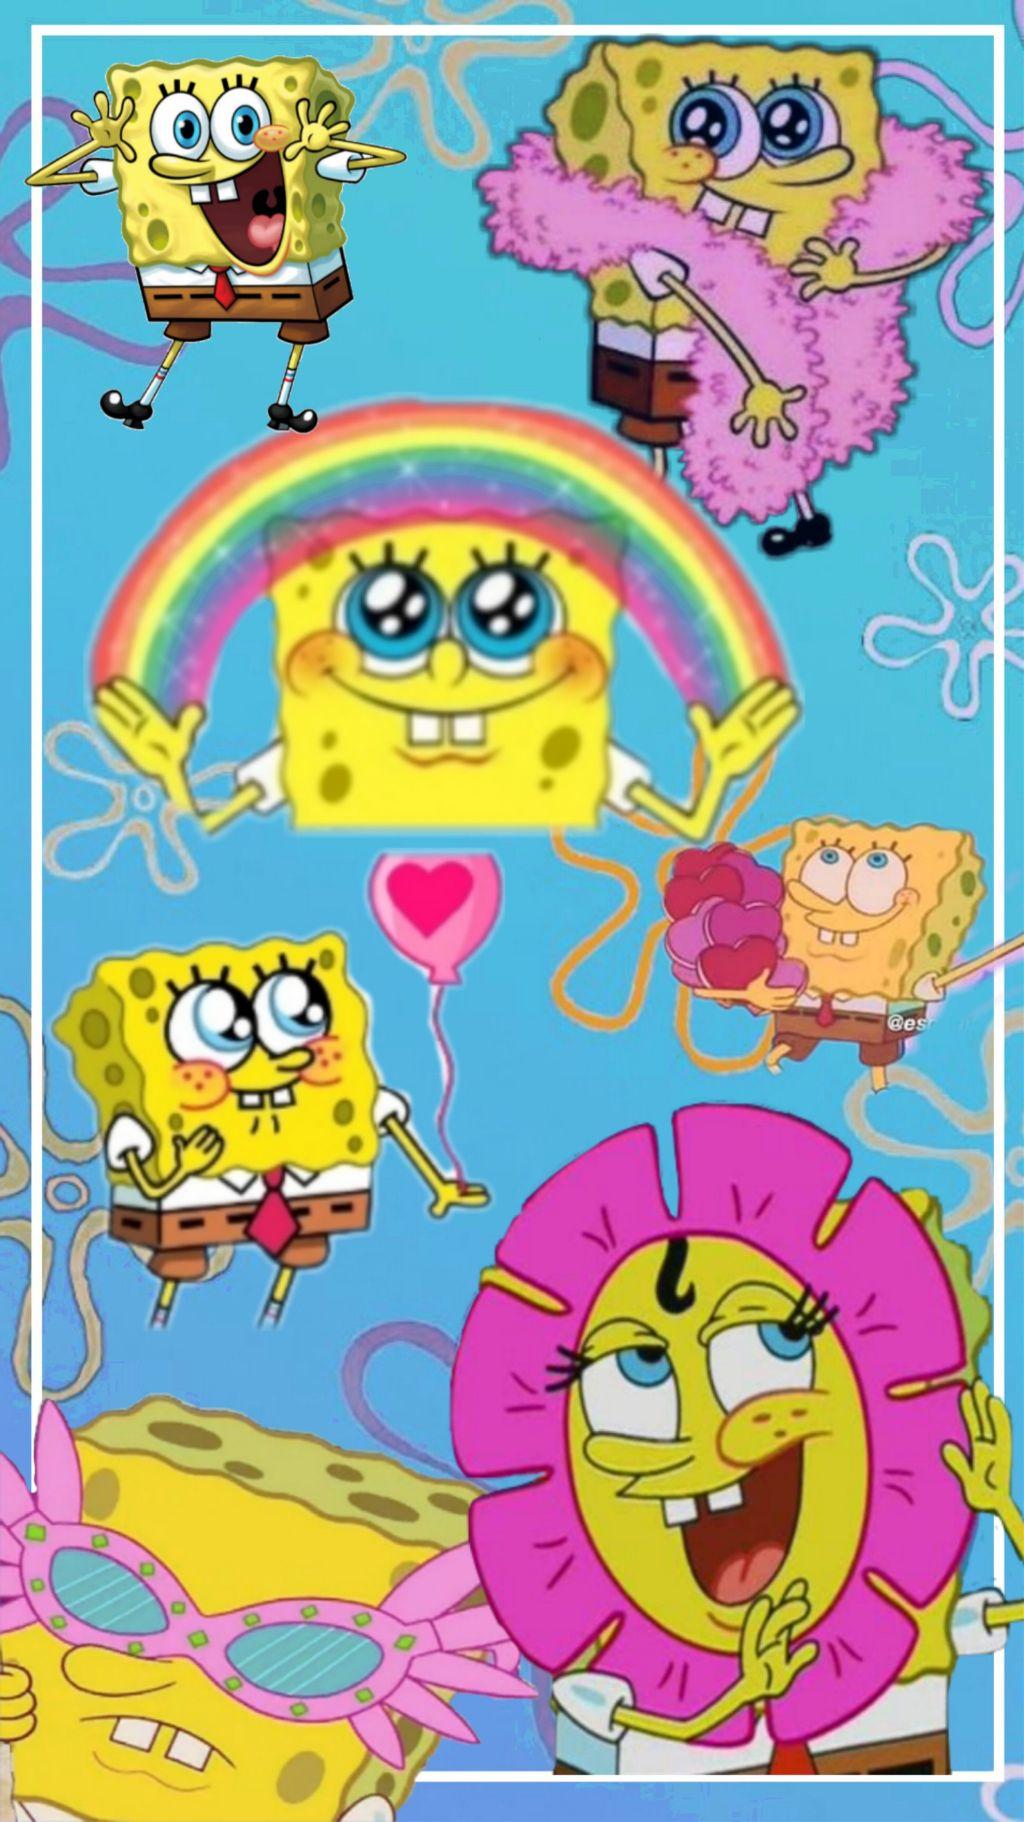 #spongebob #meme Go follow @datfashionqueen